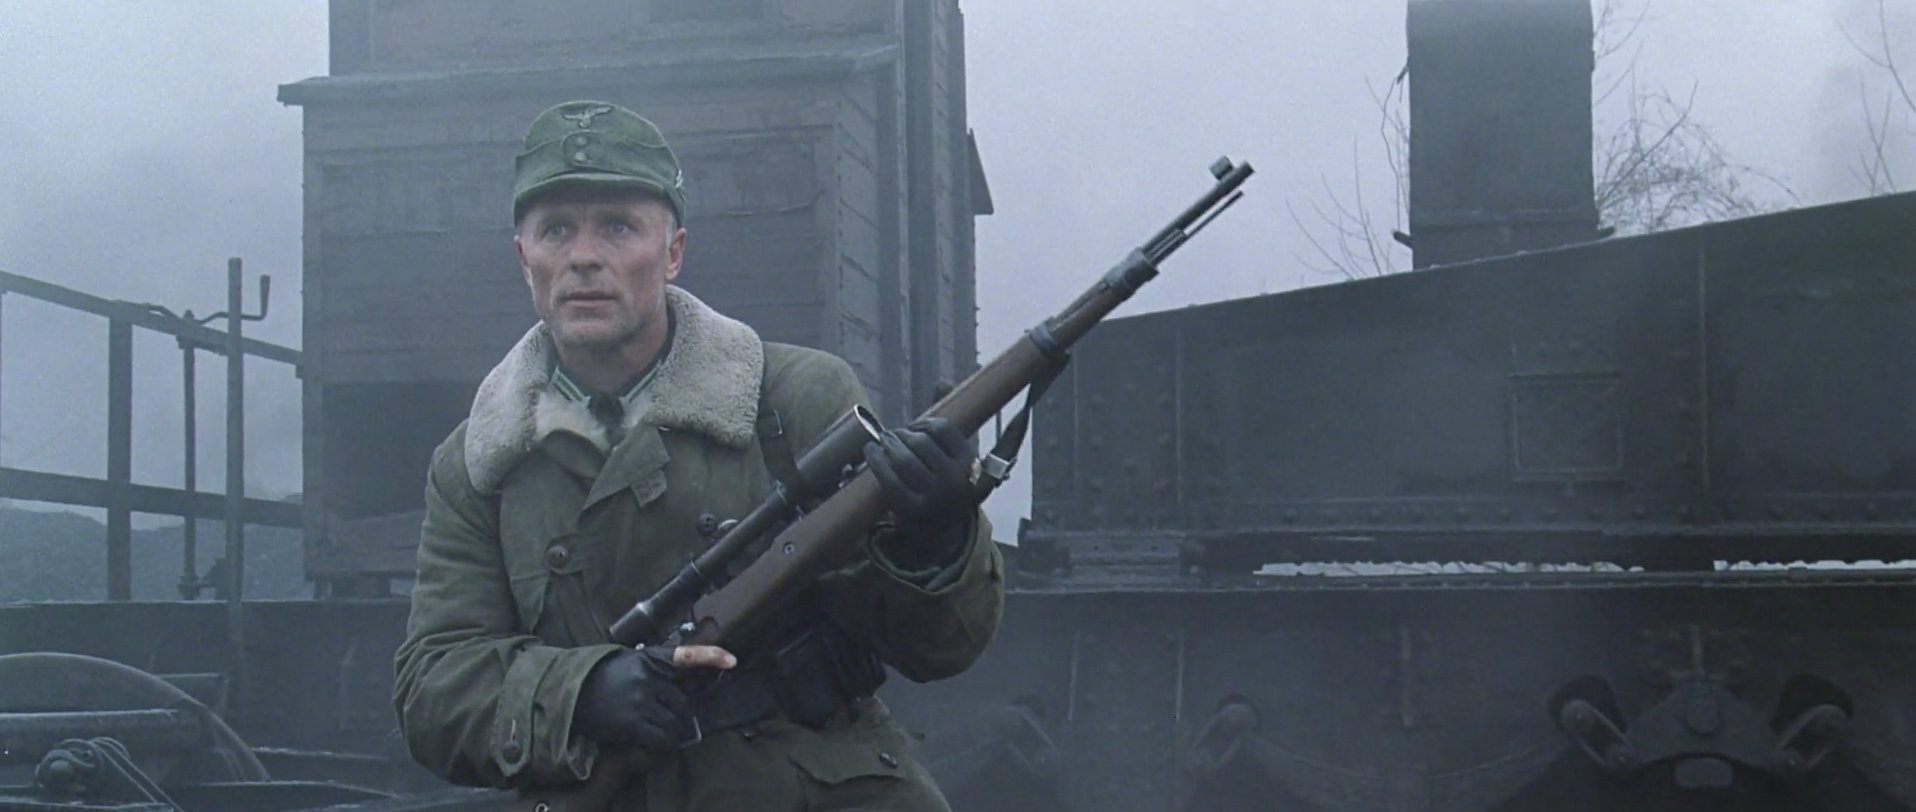 Swedish M1909 'Livpäls' Army Field Coat. In Enemy at the Gates.